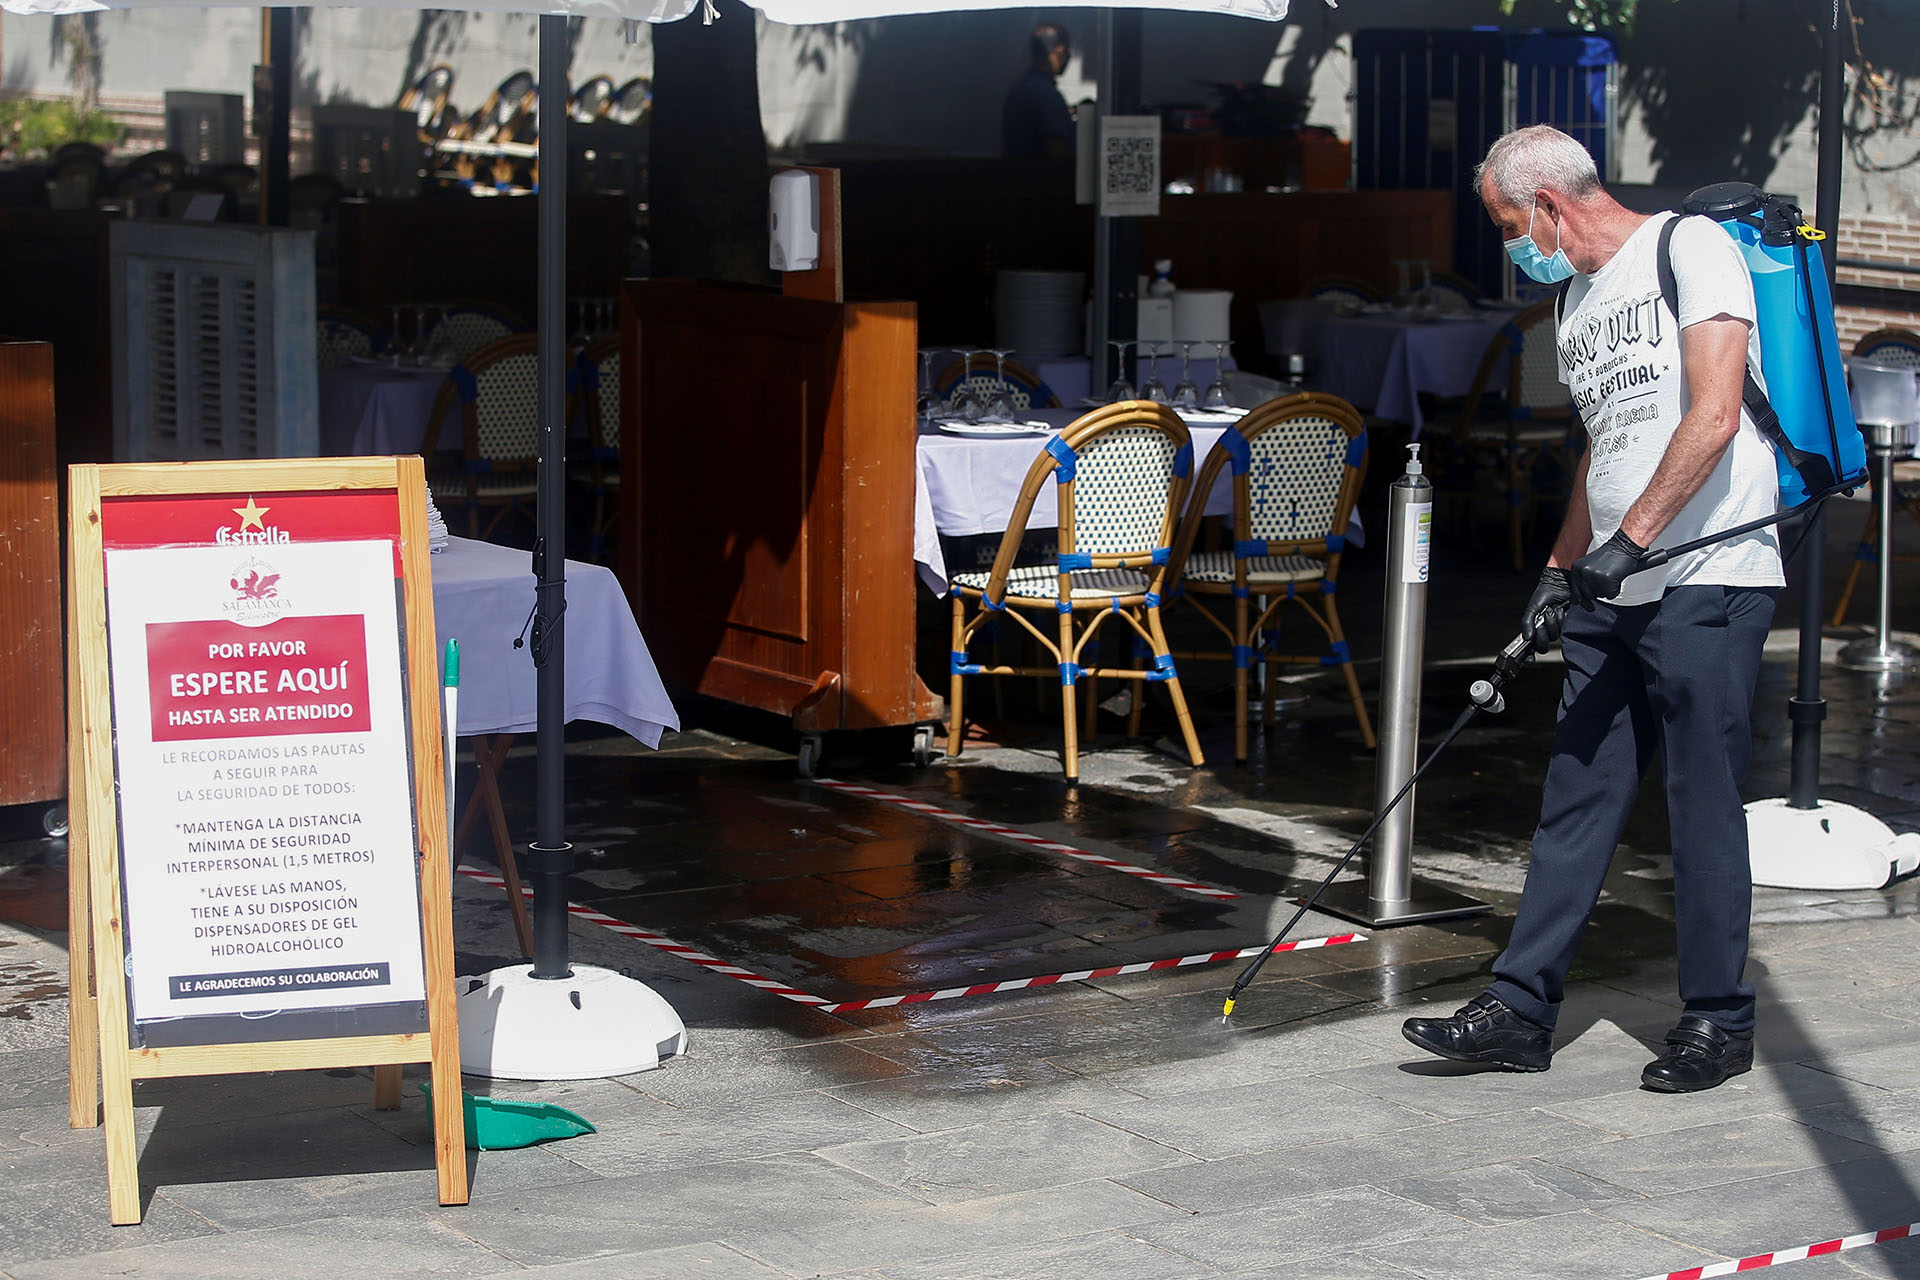 Un trabajador desinfecta la terraza de un bar en la Barceloneta. (EFE/Quique Garcia)